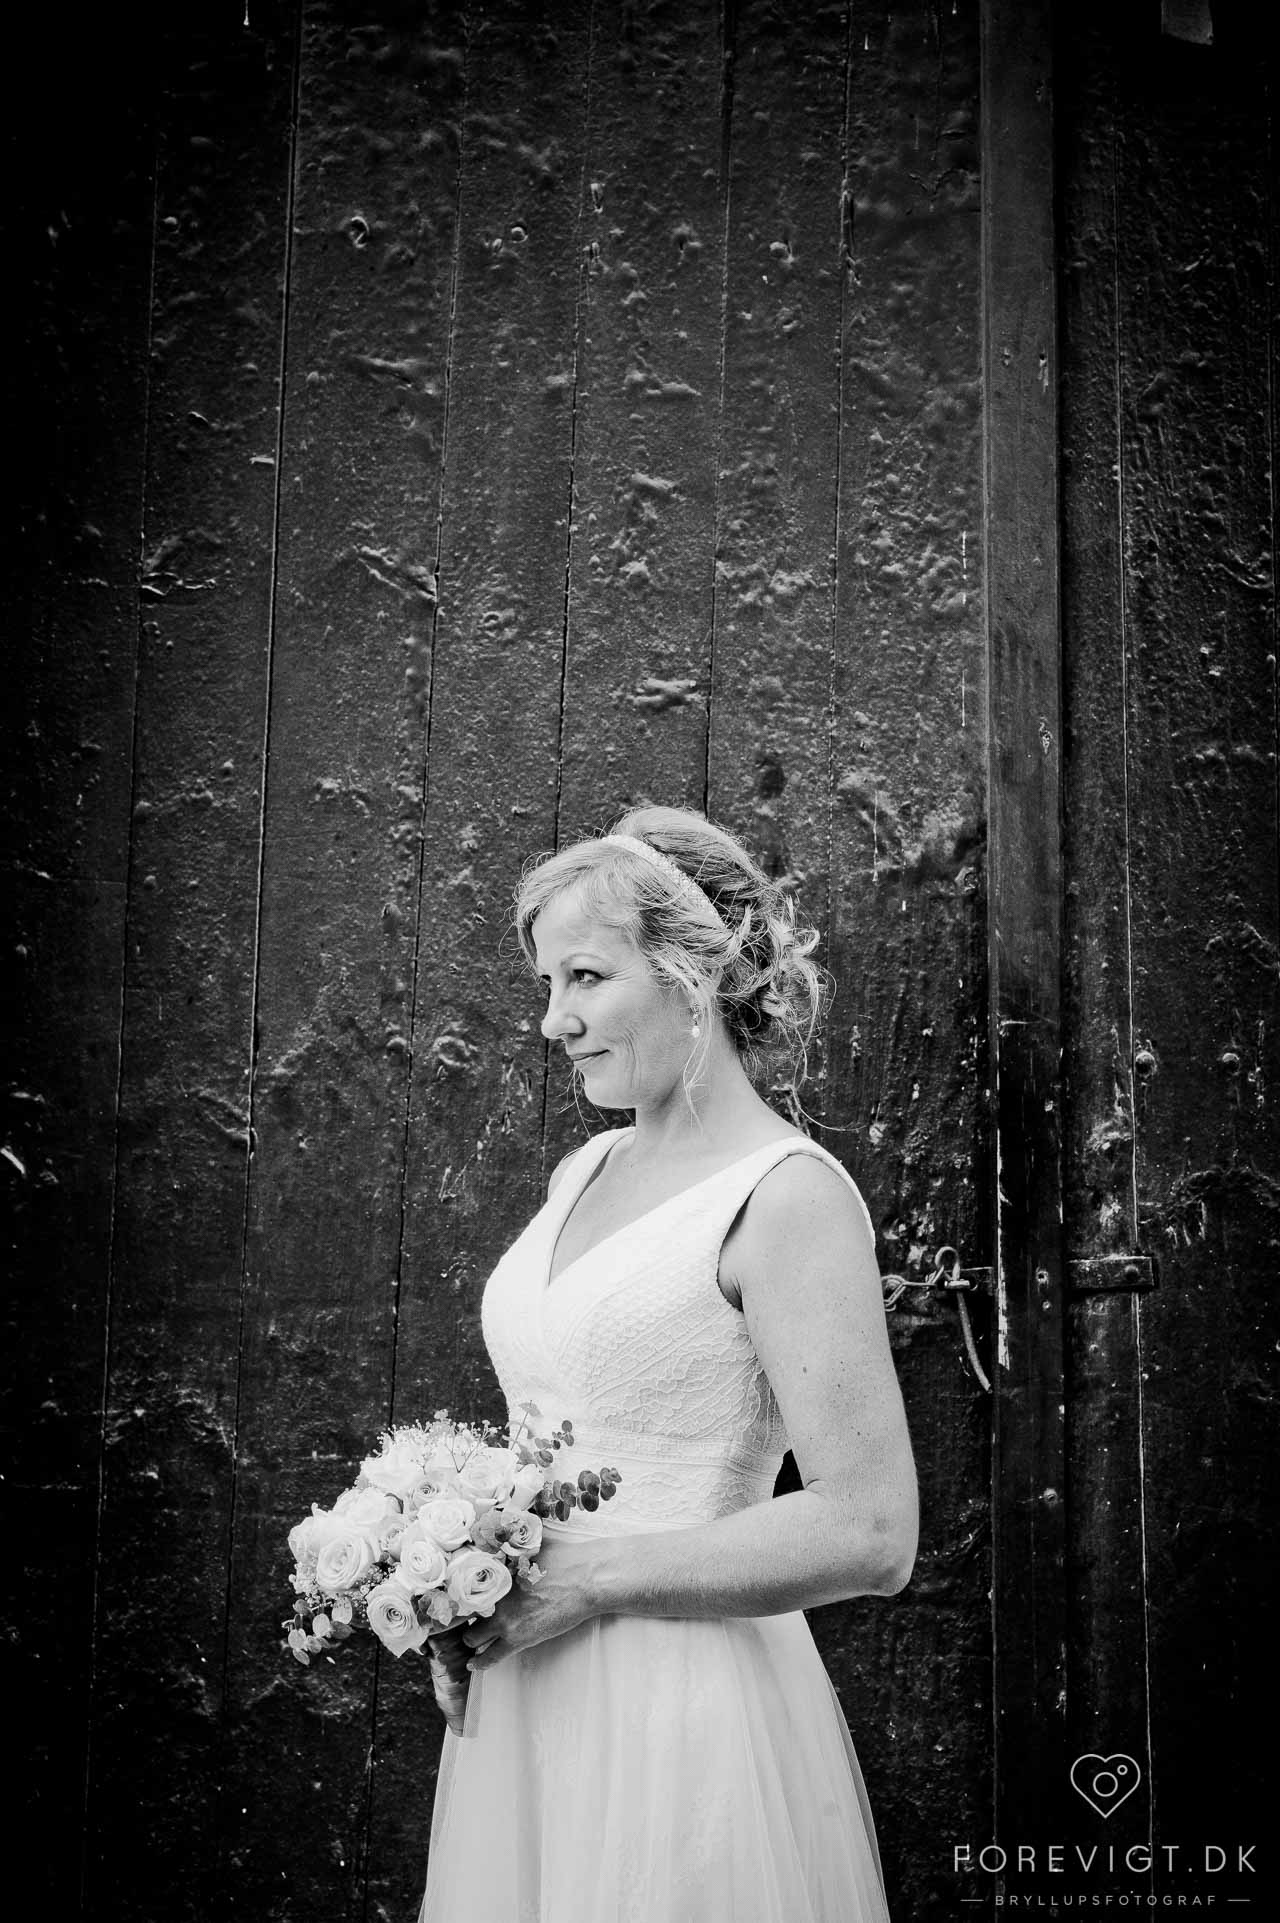 romantiske bryllupsportrætter